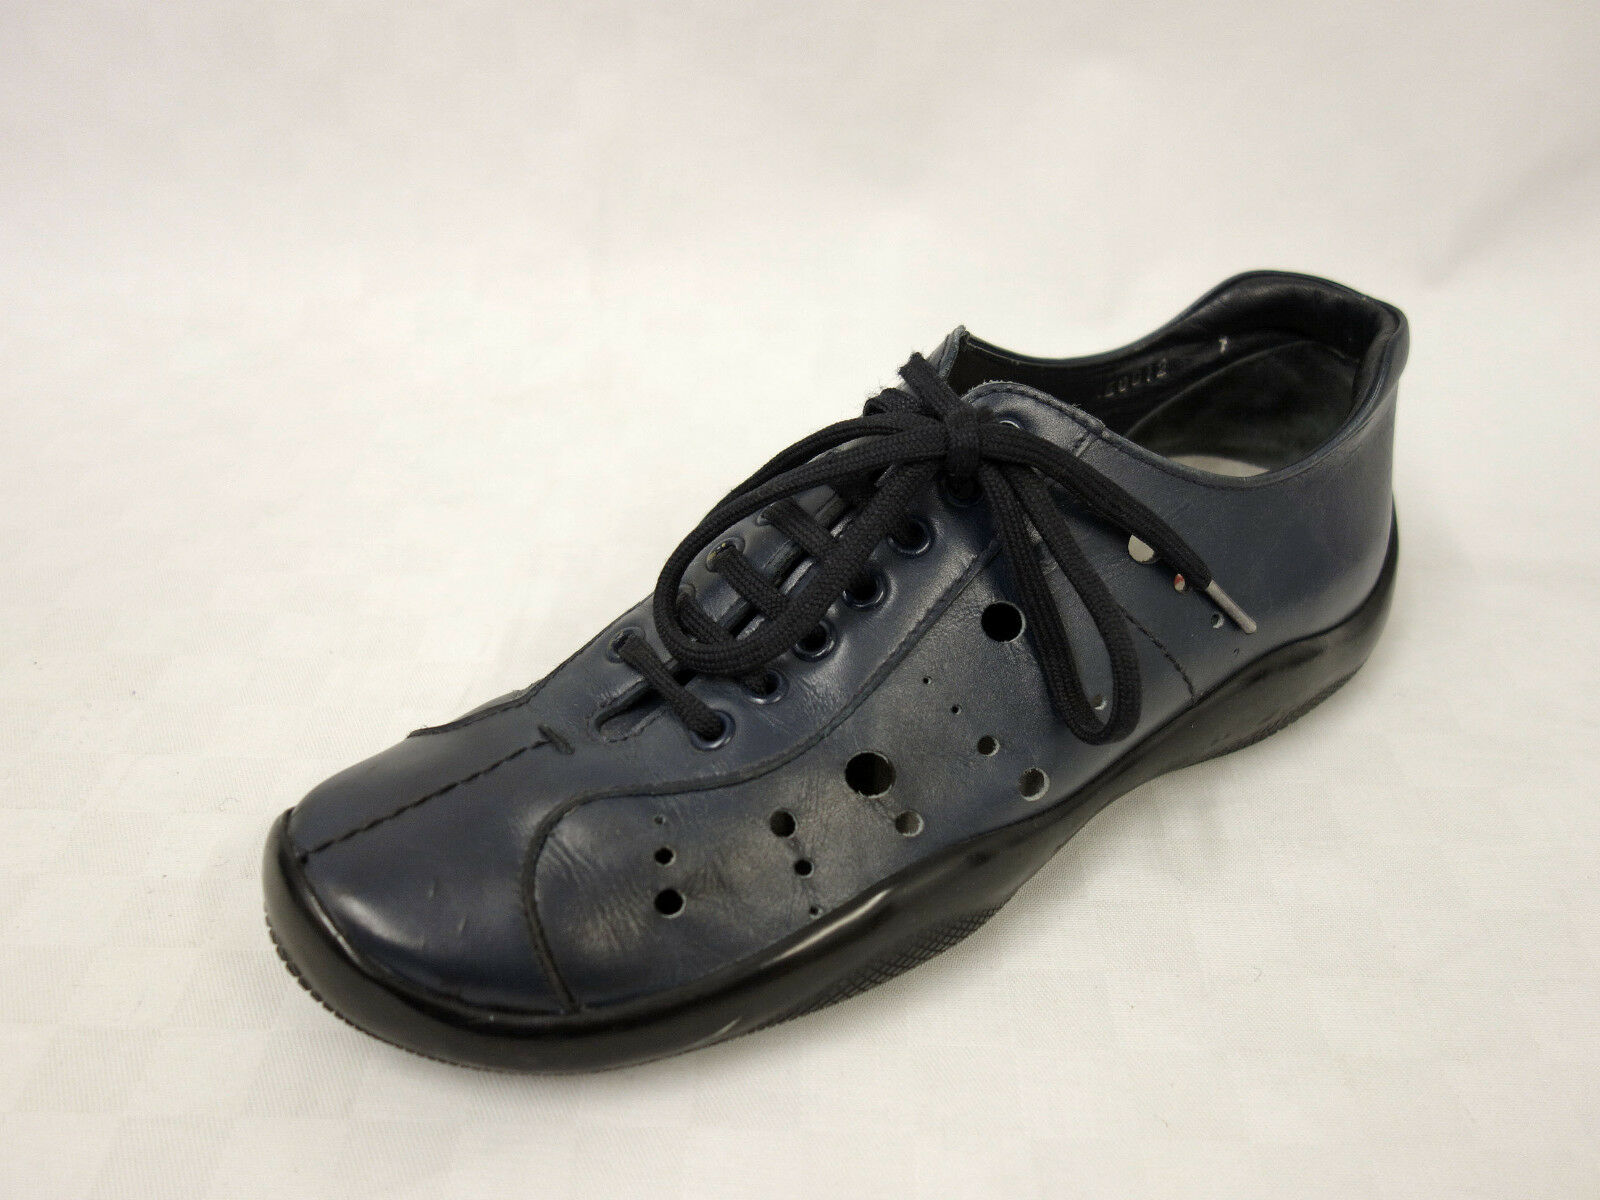 PRADA Leder Schnürer Gr.41UK7 Turnschuhe Schuhe Halbschuhe Leather schuhe Blau    | Modisch